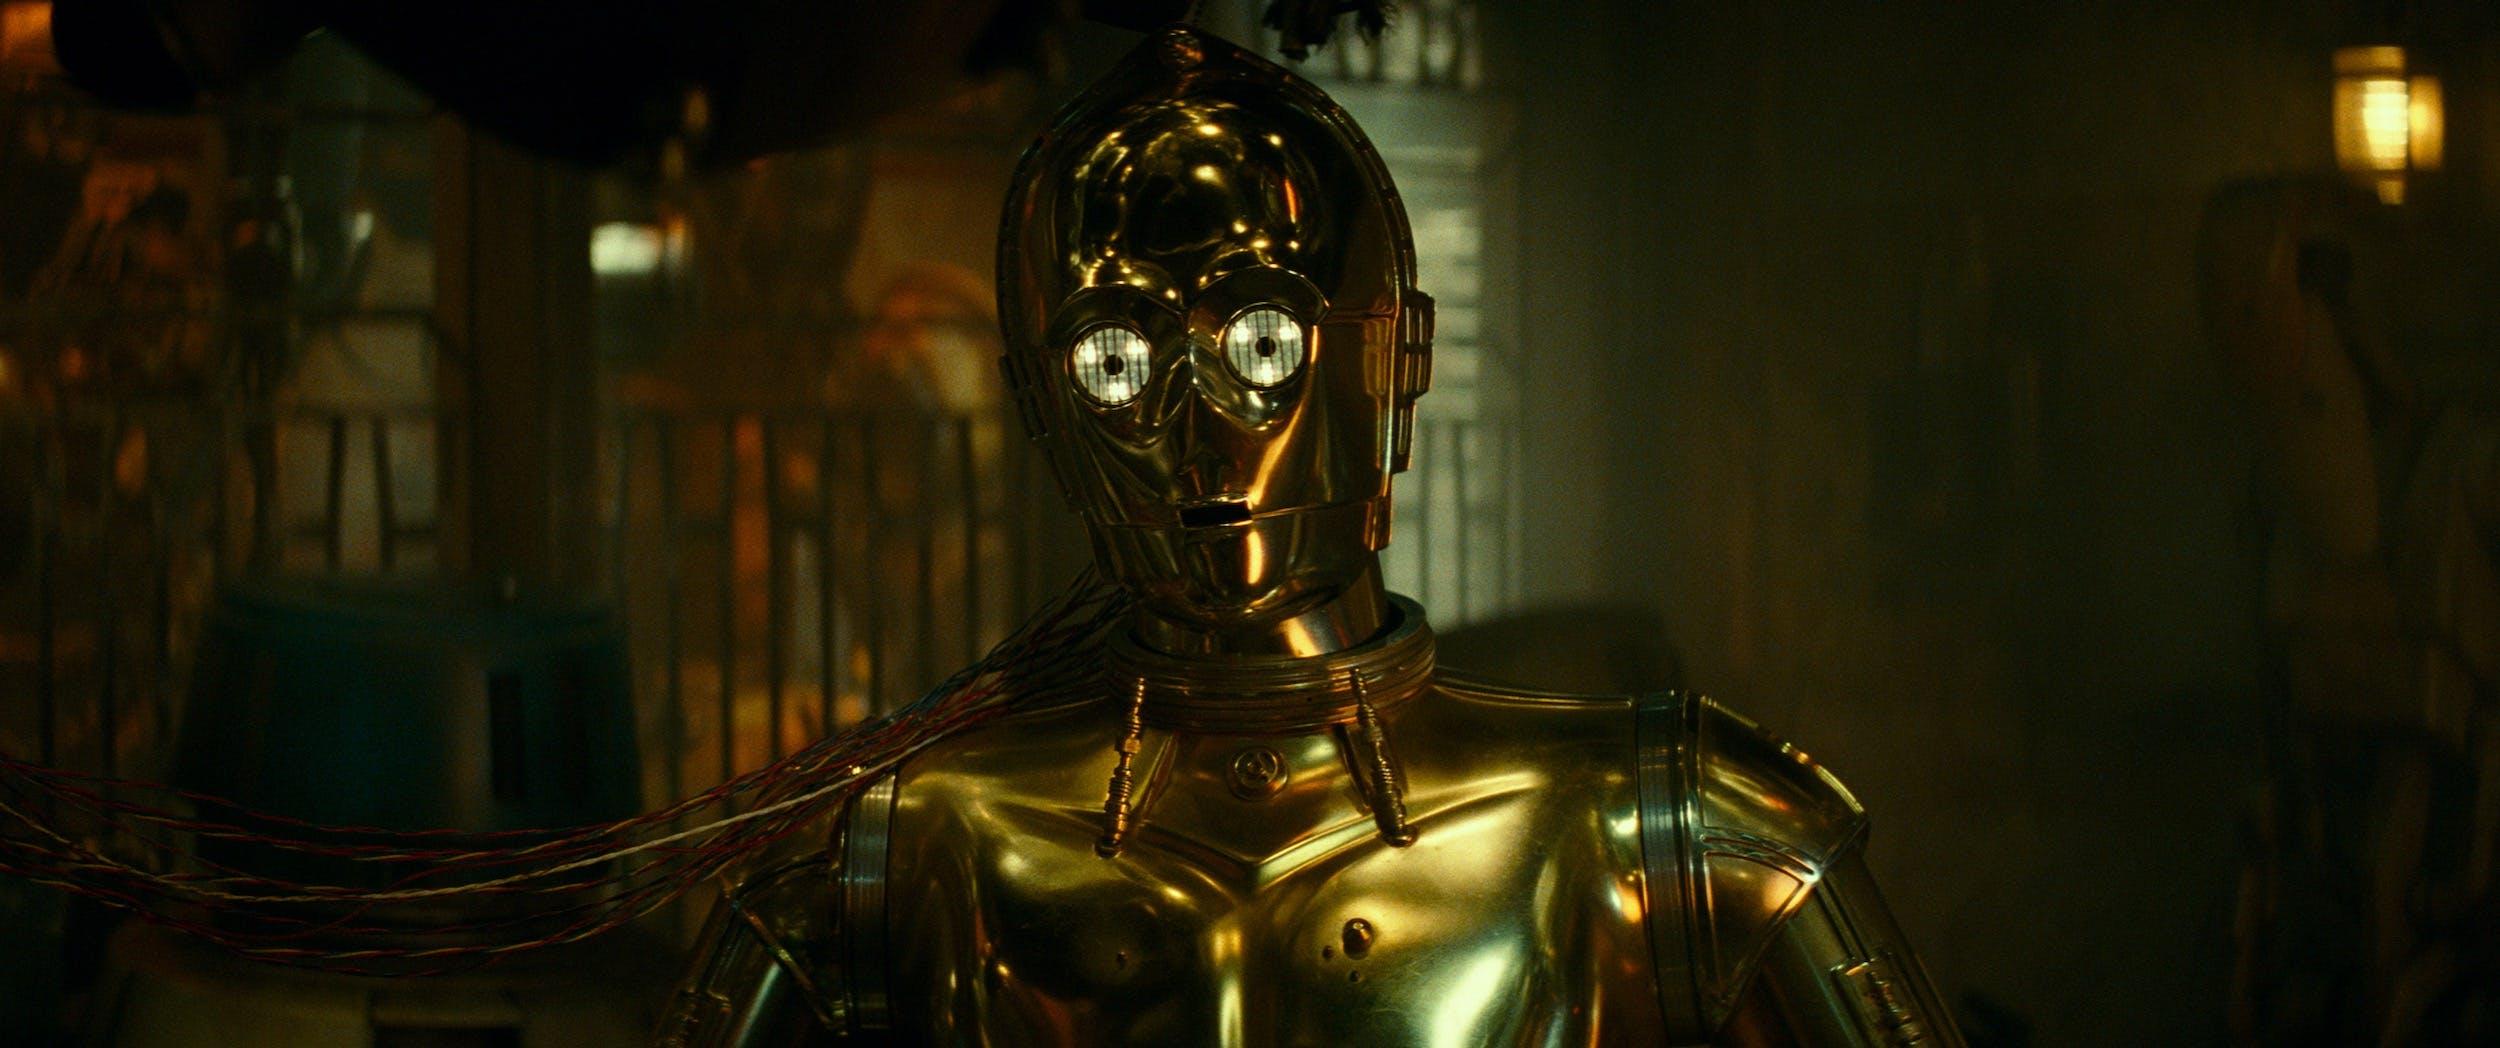 star wars rise of skywalker c3po